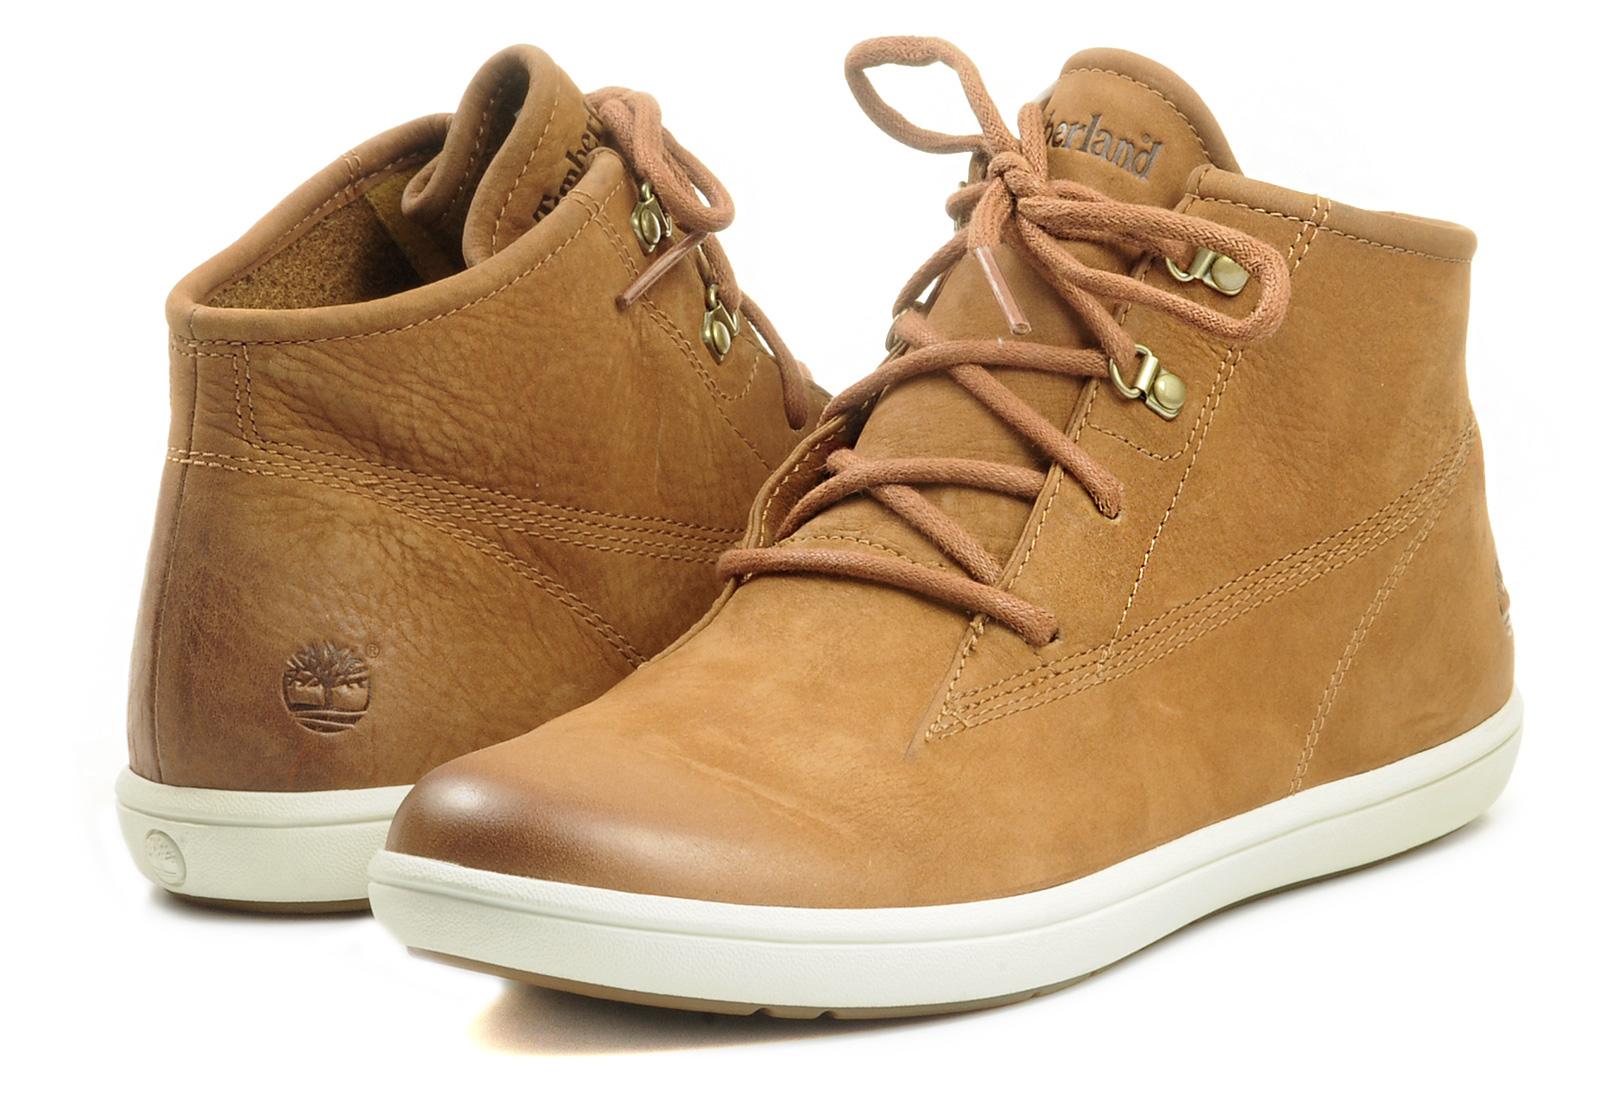 Timberland Shoes - ek northprt chukka - 8502r-brn - Online shop for ... c8ca654be14